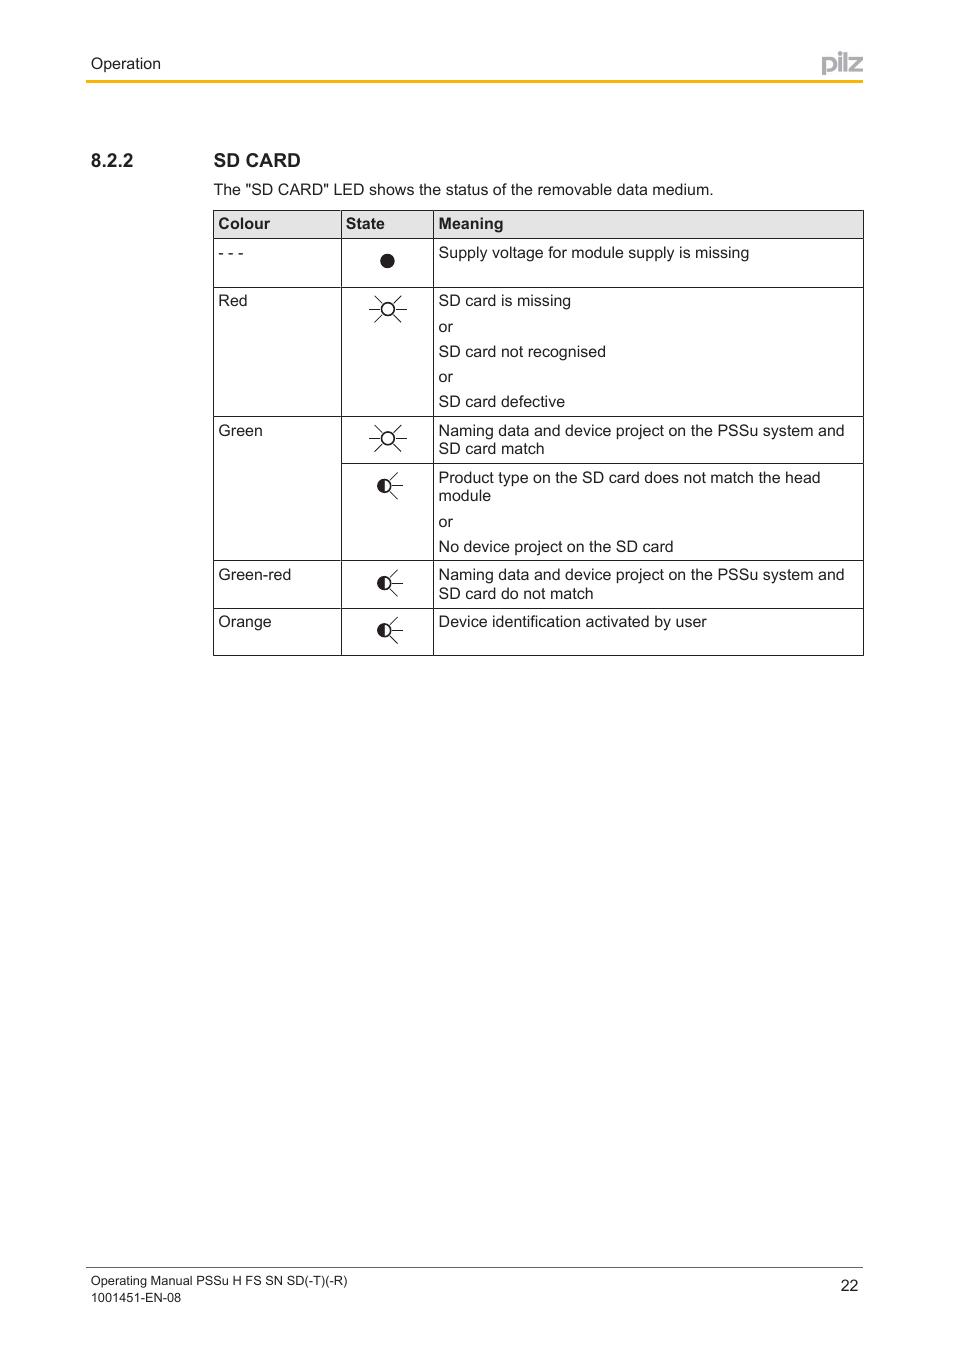 2 sd card, Sd card | Pilz PSSu H FS SN SD User Manual | Page